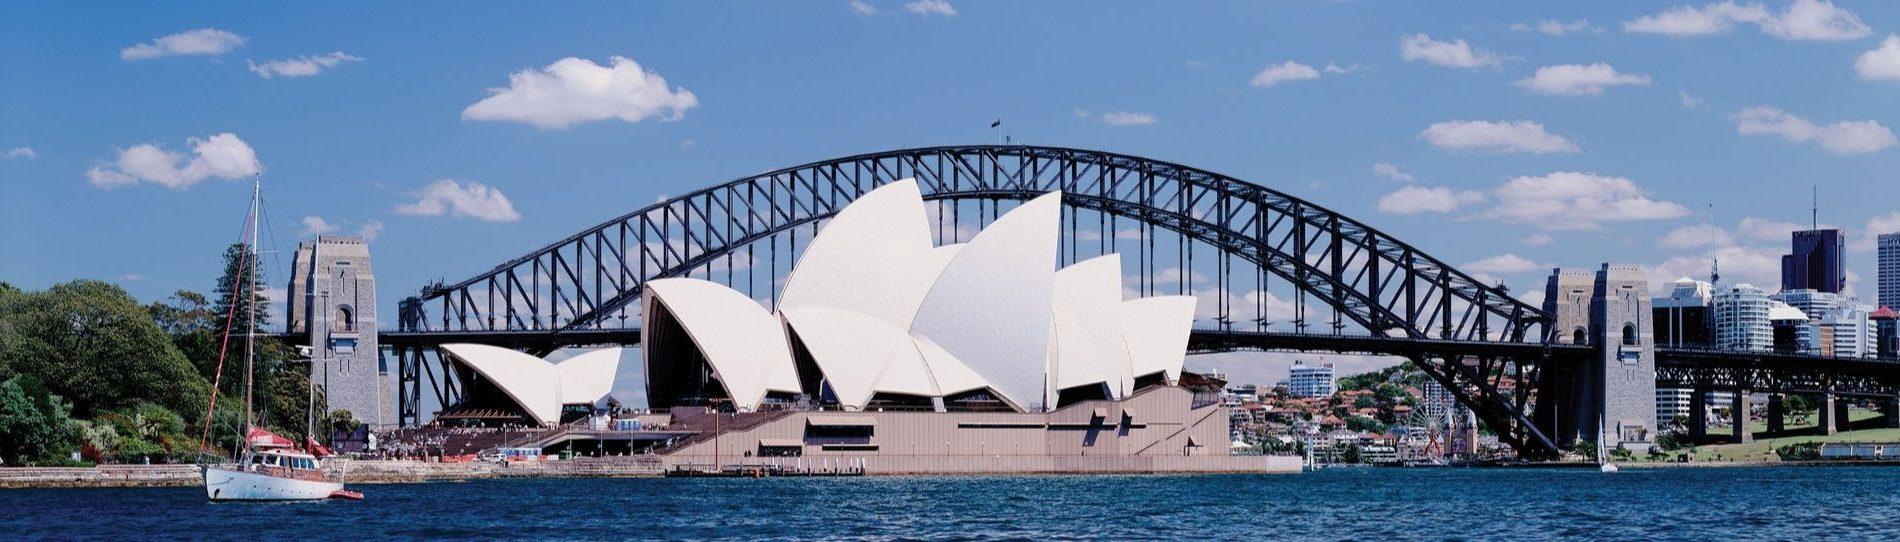 team trips sydney destination main image